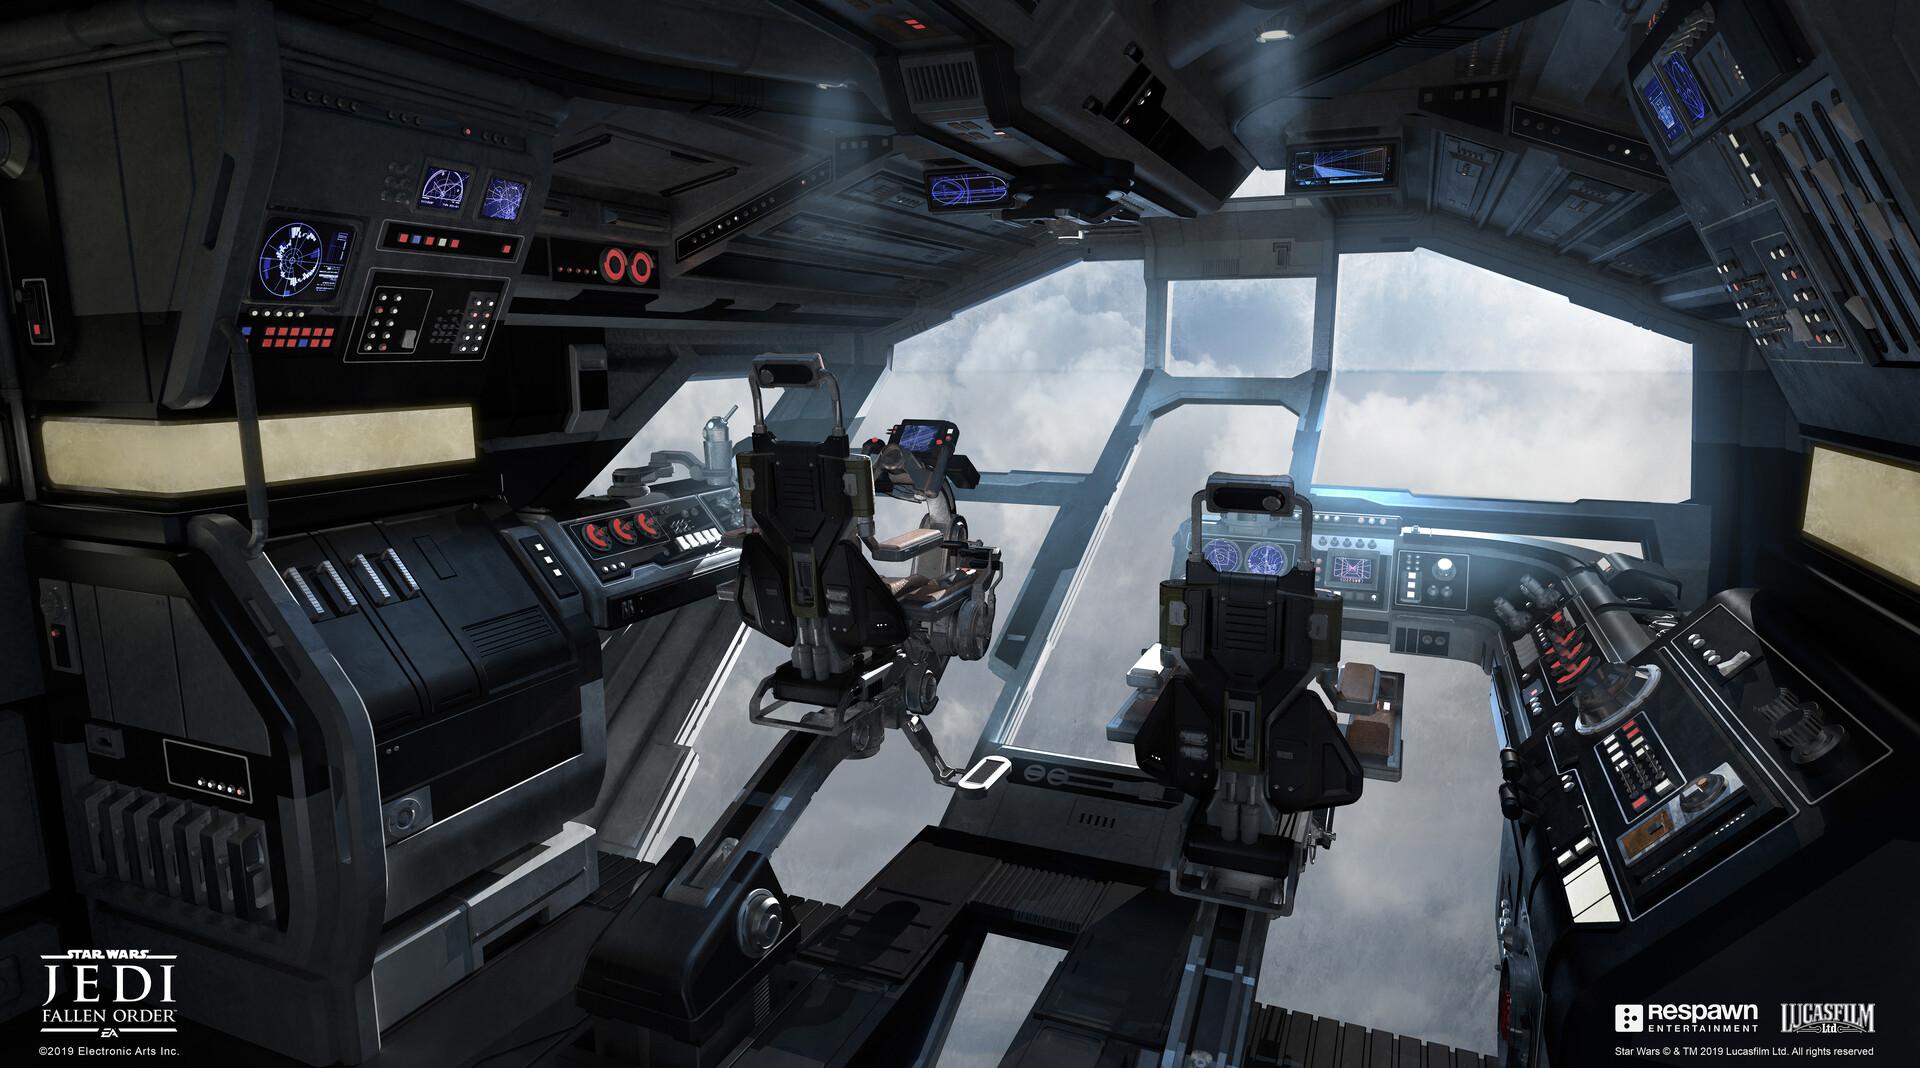 jean-francois-rey-cockpit-01.jpg?1579984